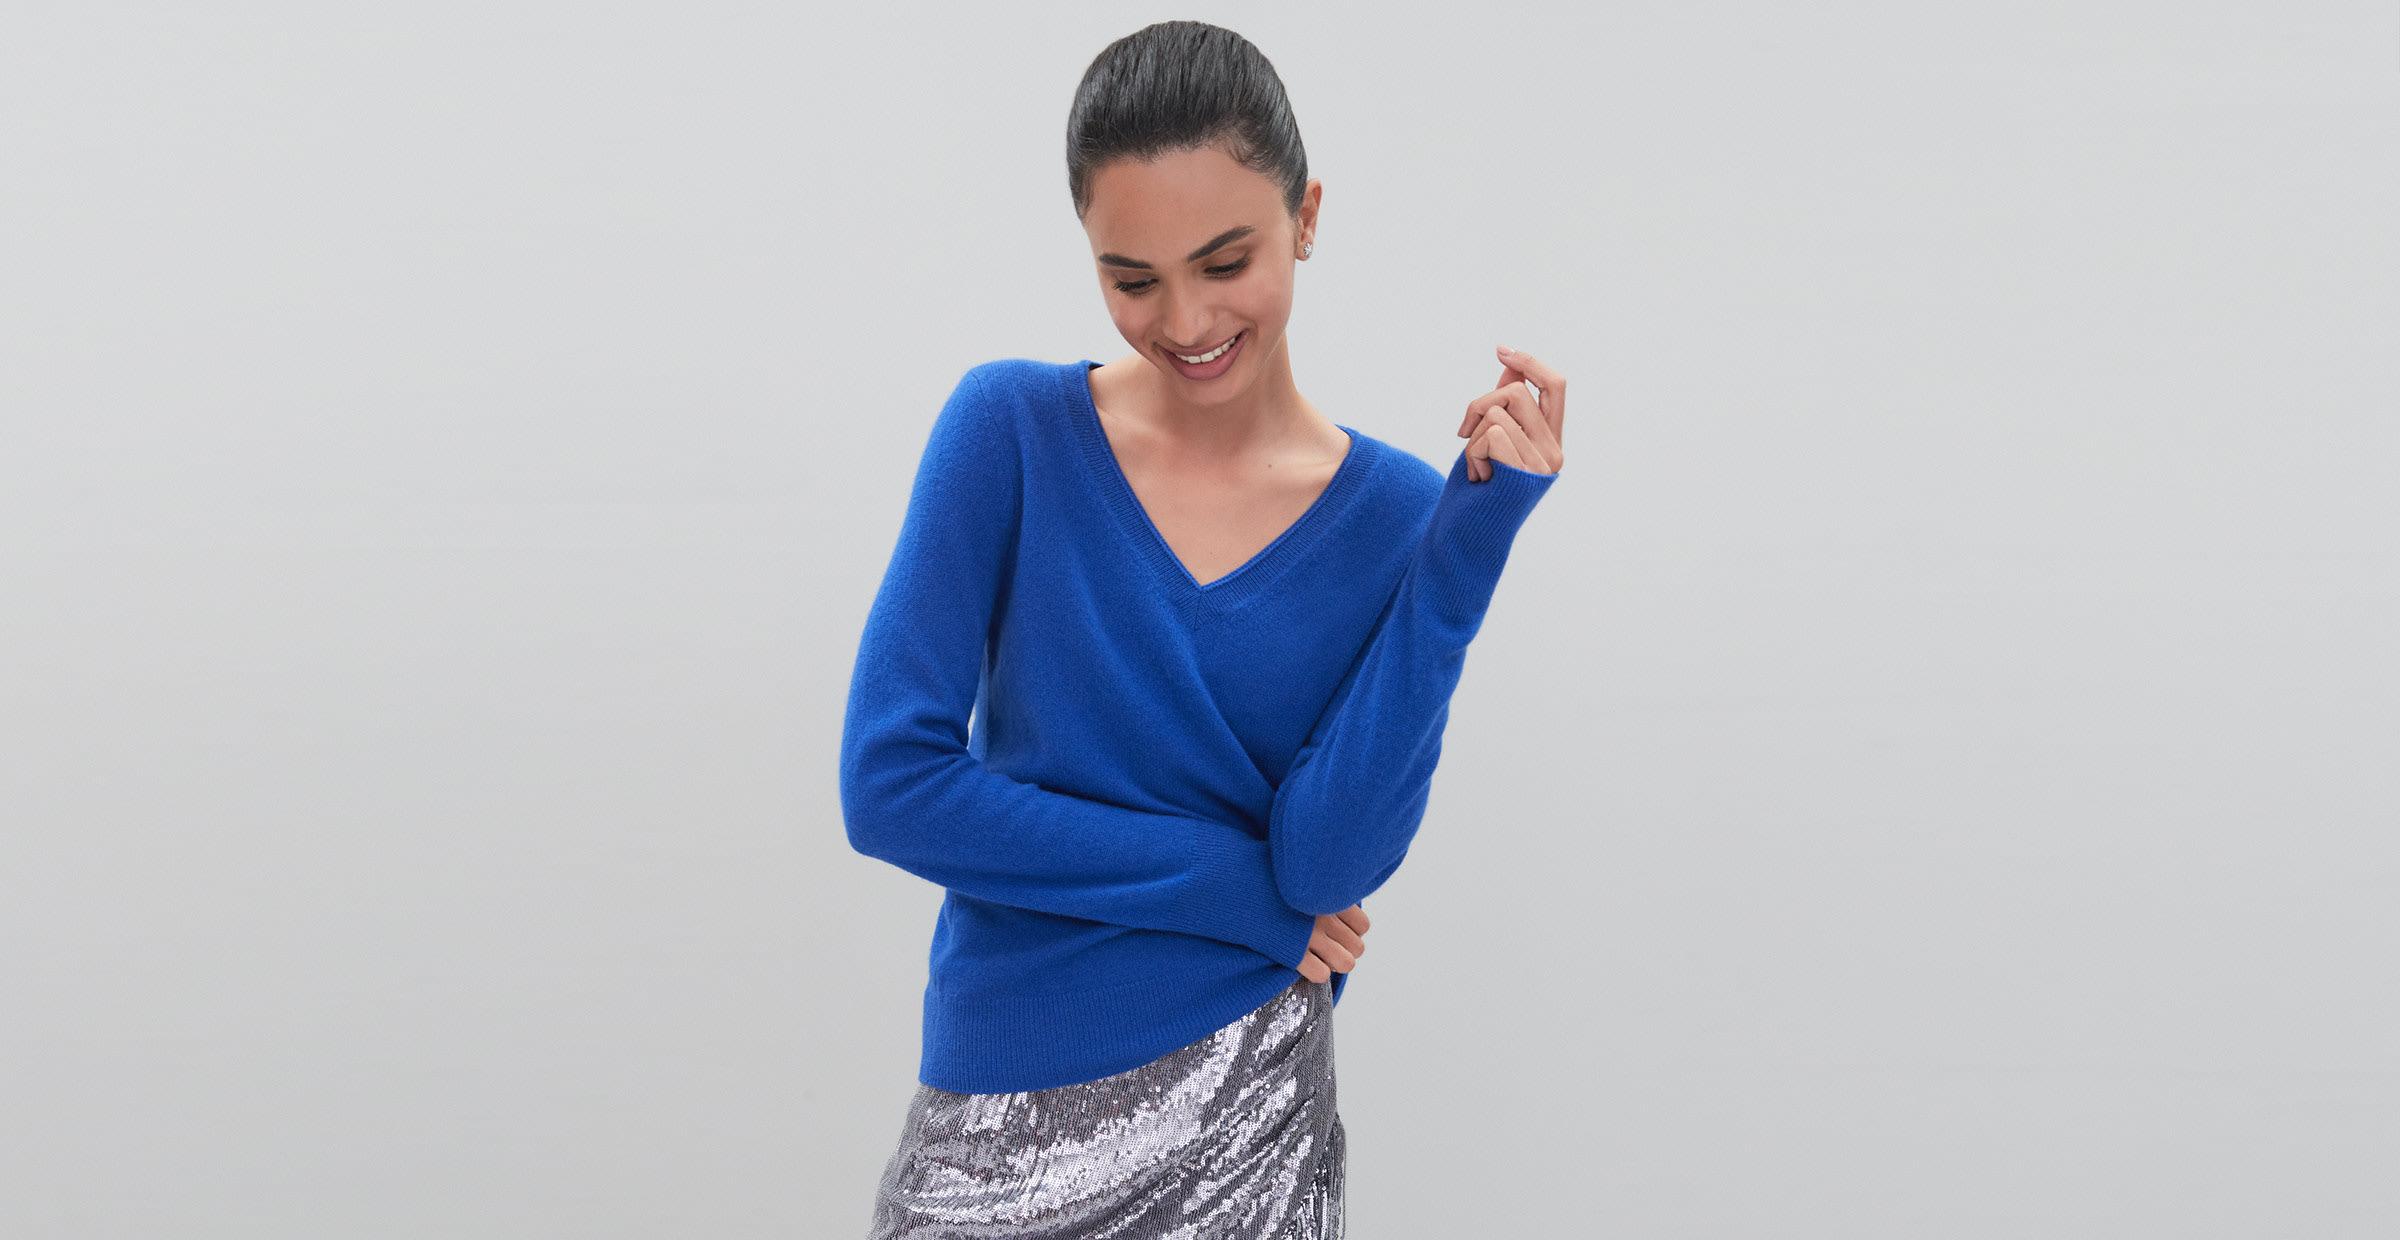 Woman wearing blue sweater and silver metallic skirt.